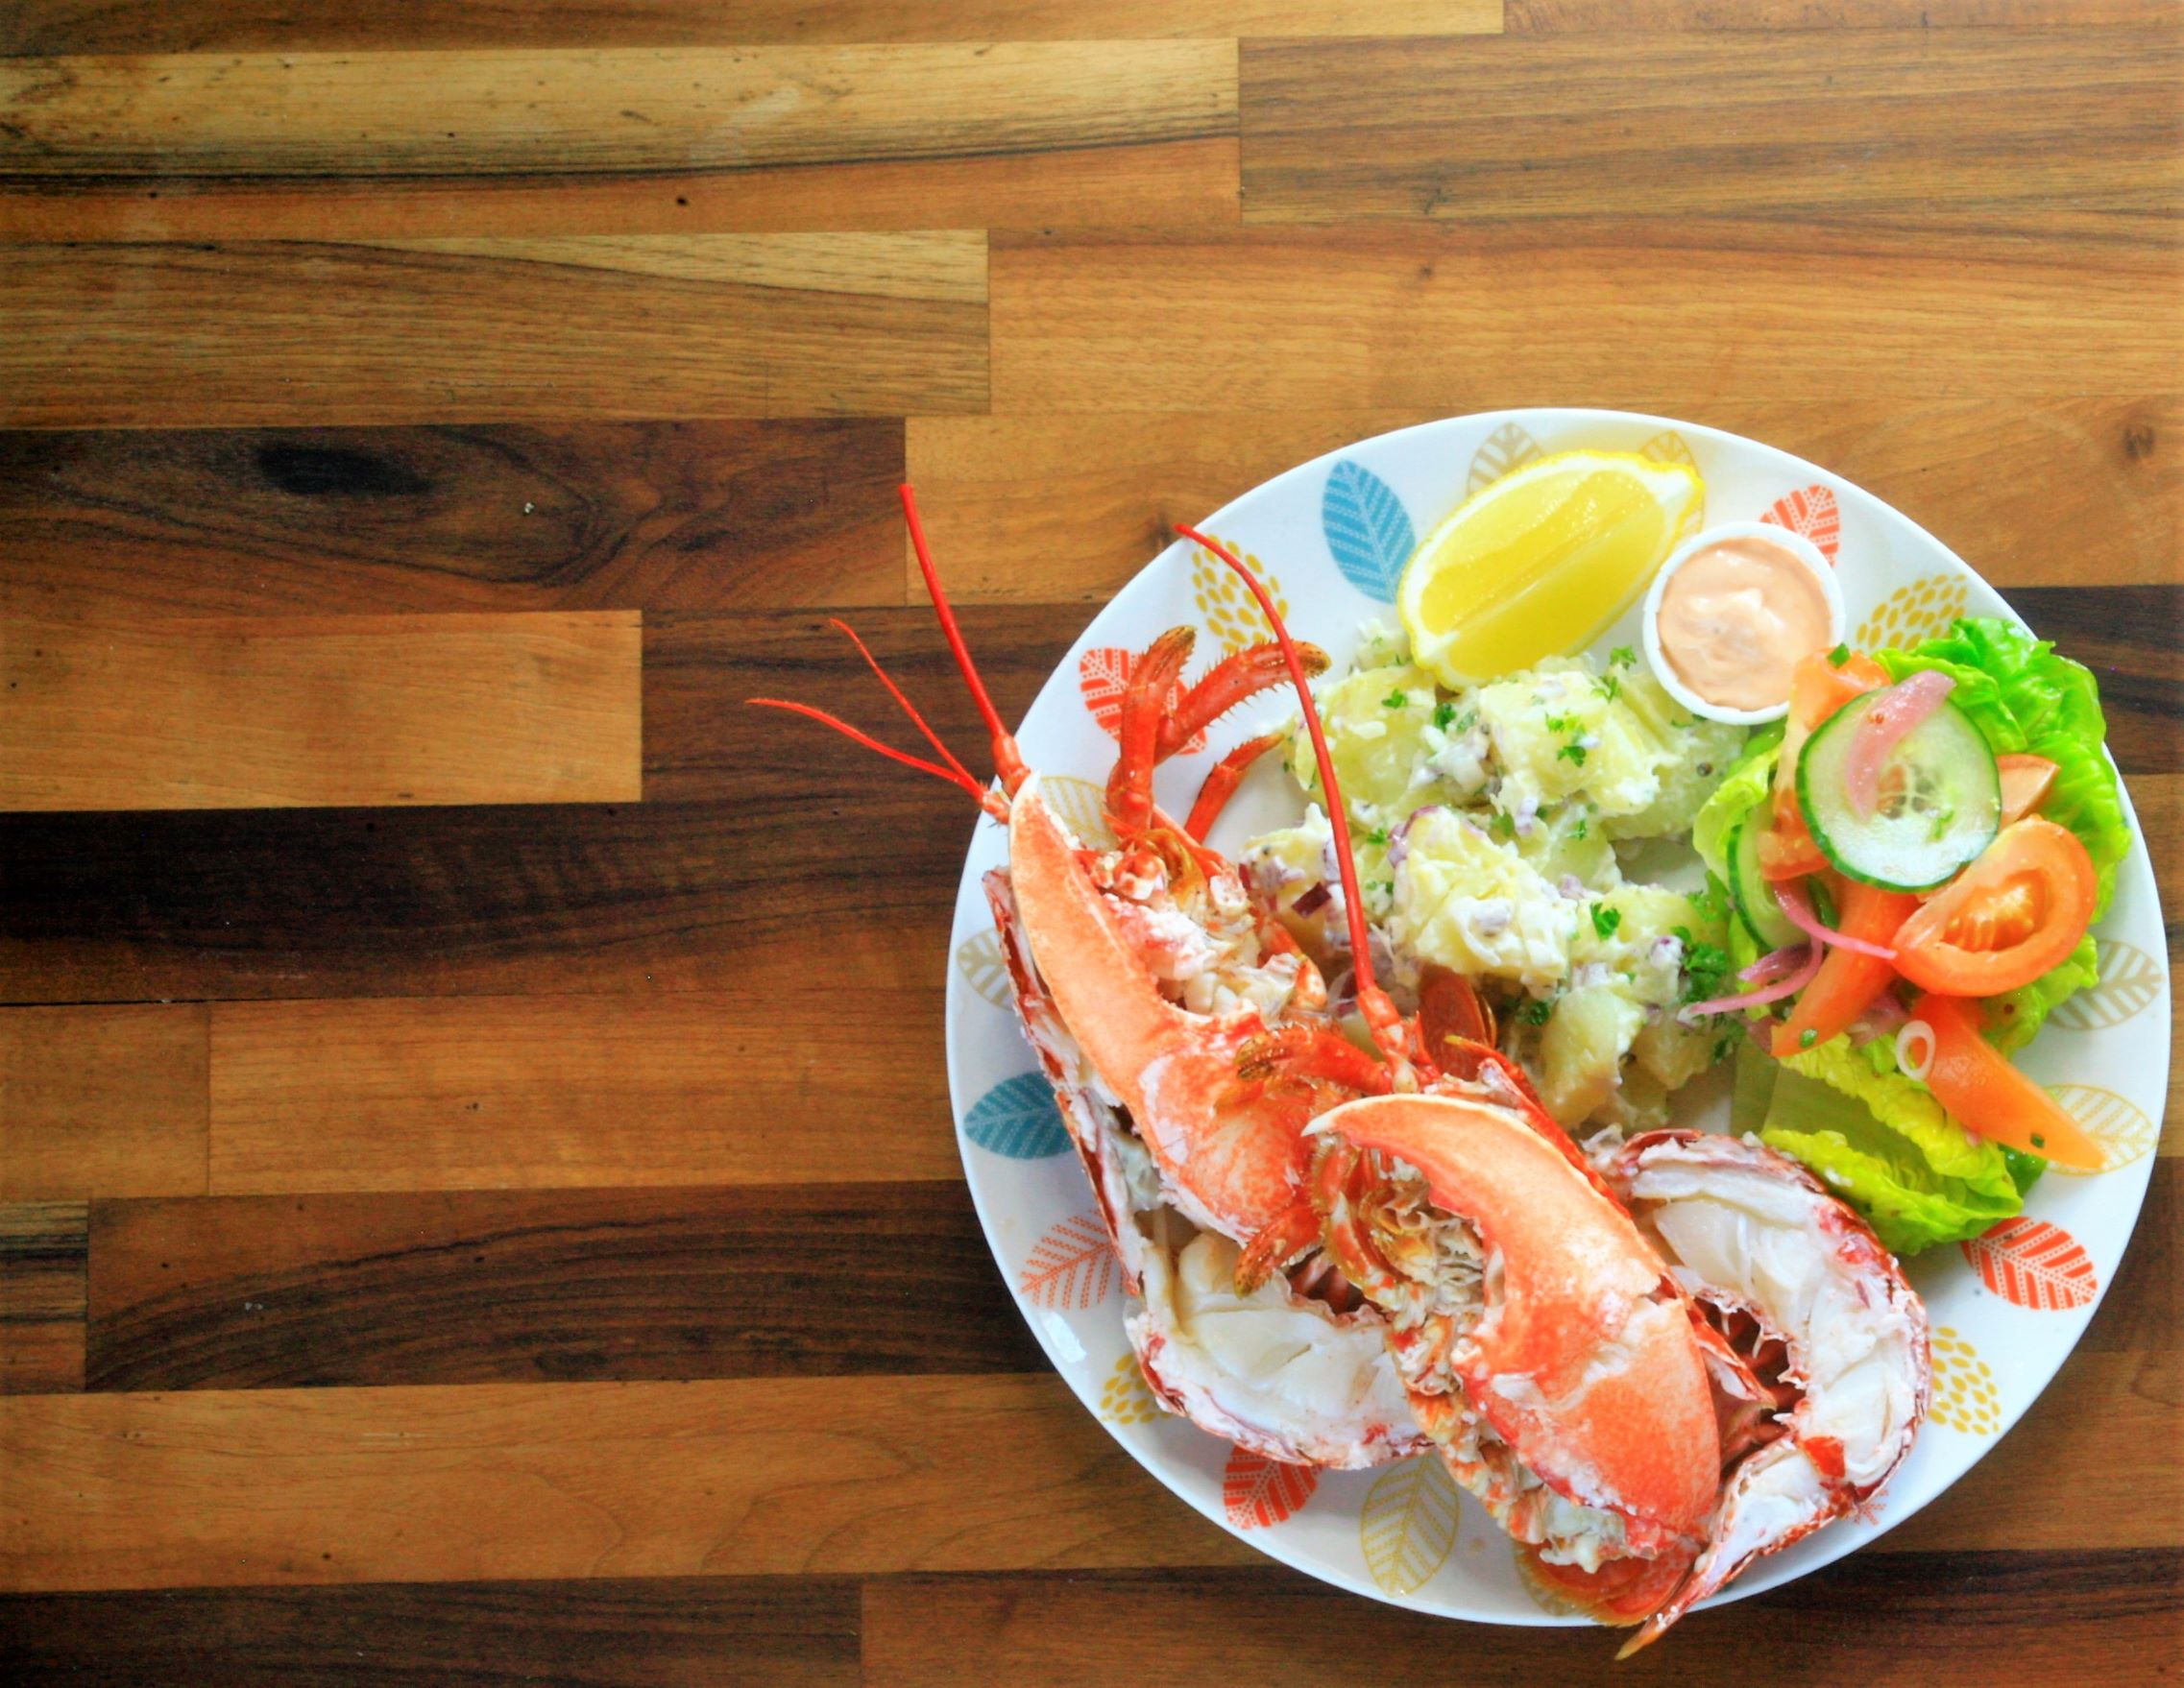 Whole Native Lobster Potato Salad, garden salad and lemon. (48 hrs)